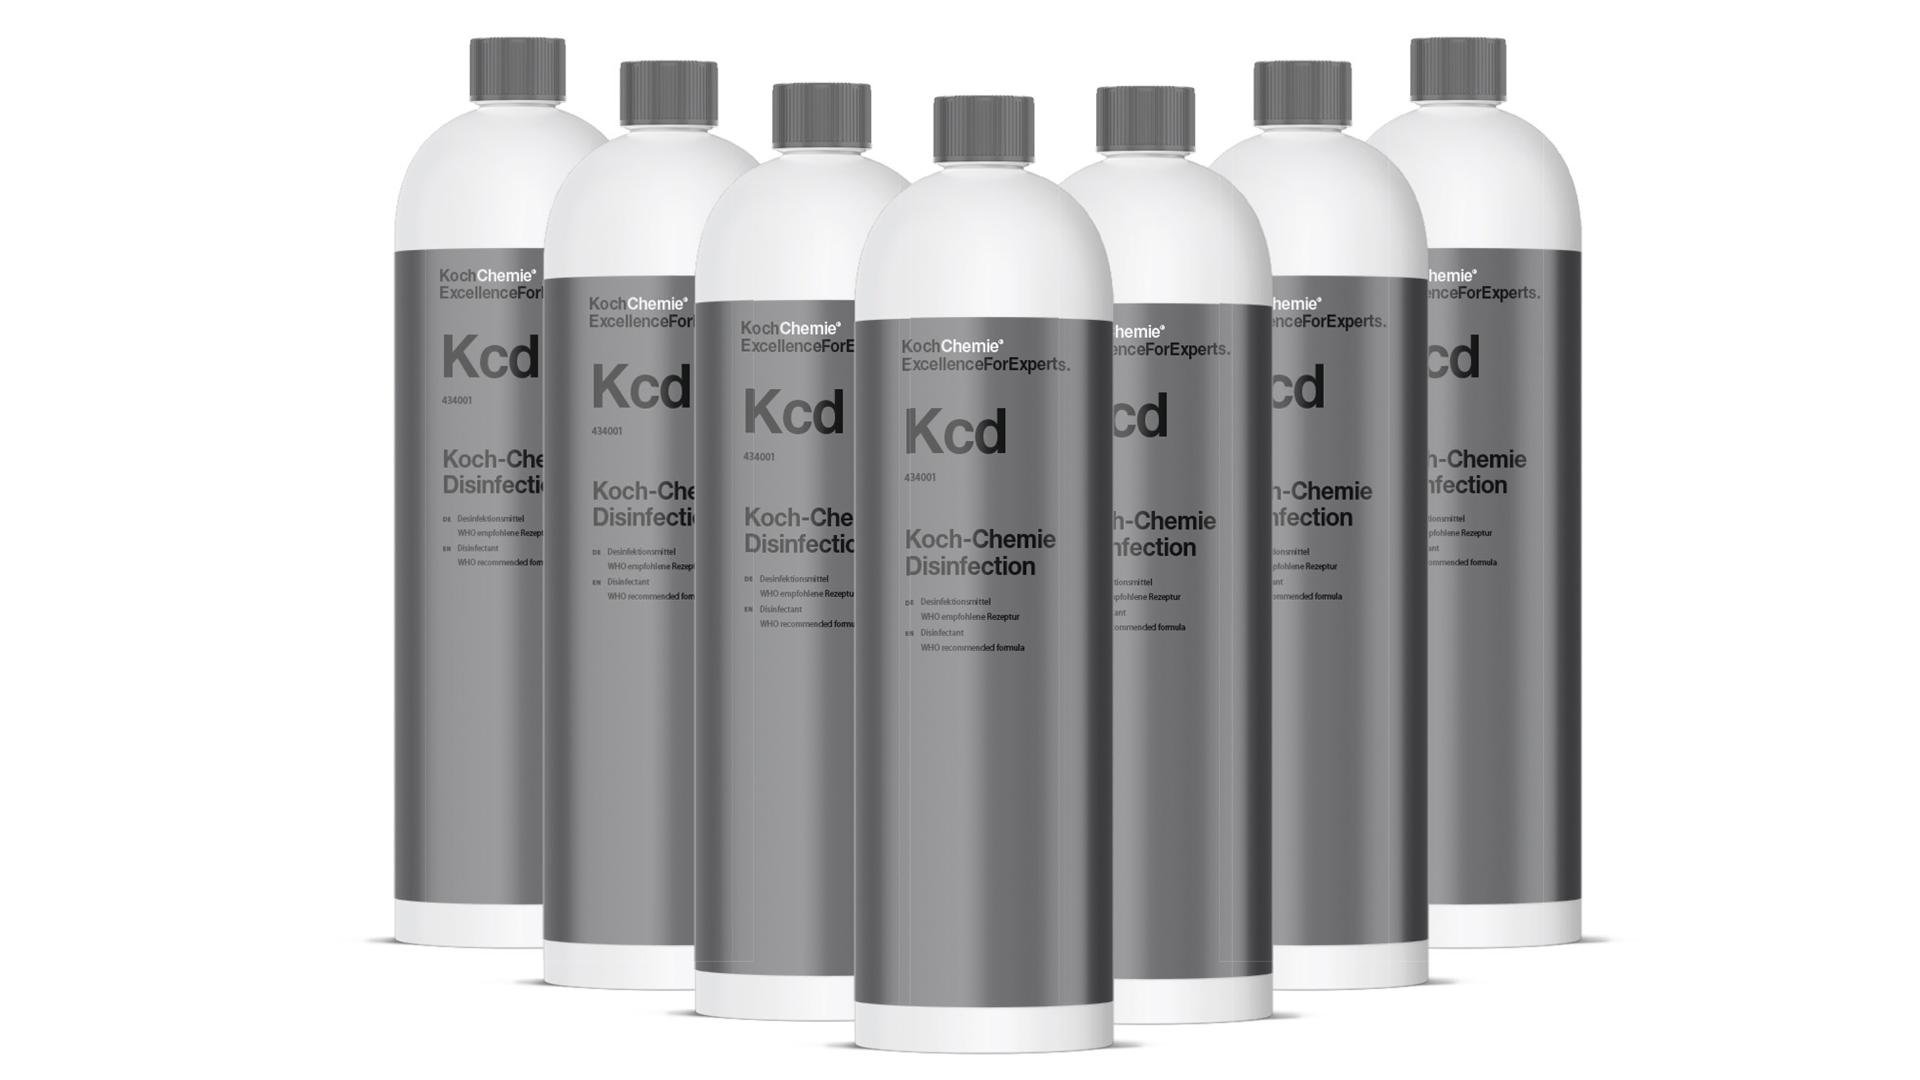 Koch-Chemie Disinfection Kcd - Desinfektionsmittel nach WHO-empfohlener Rezeptur